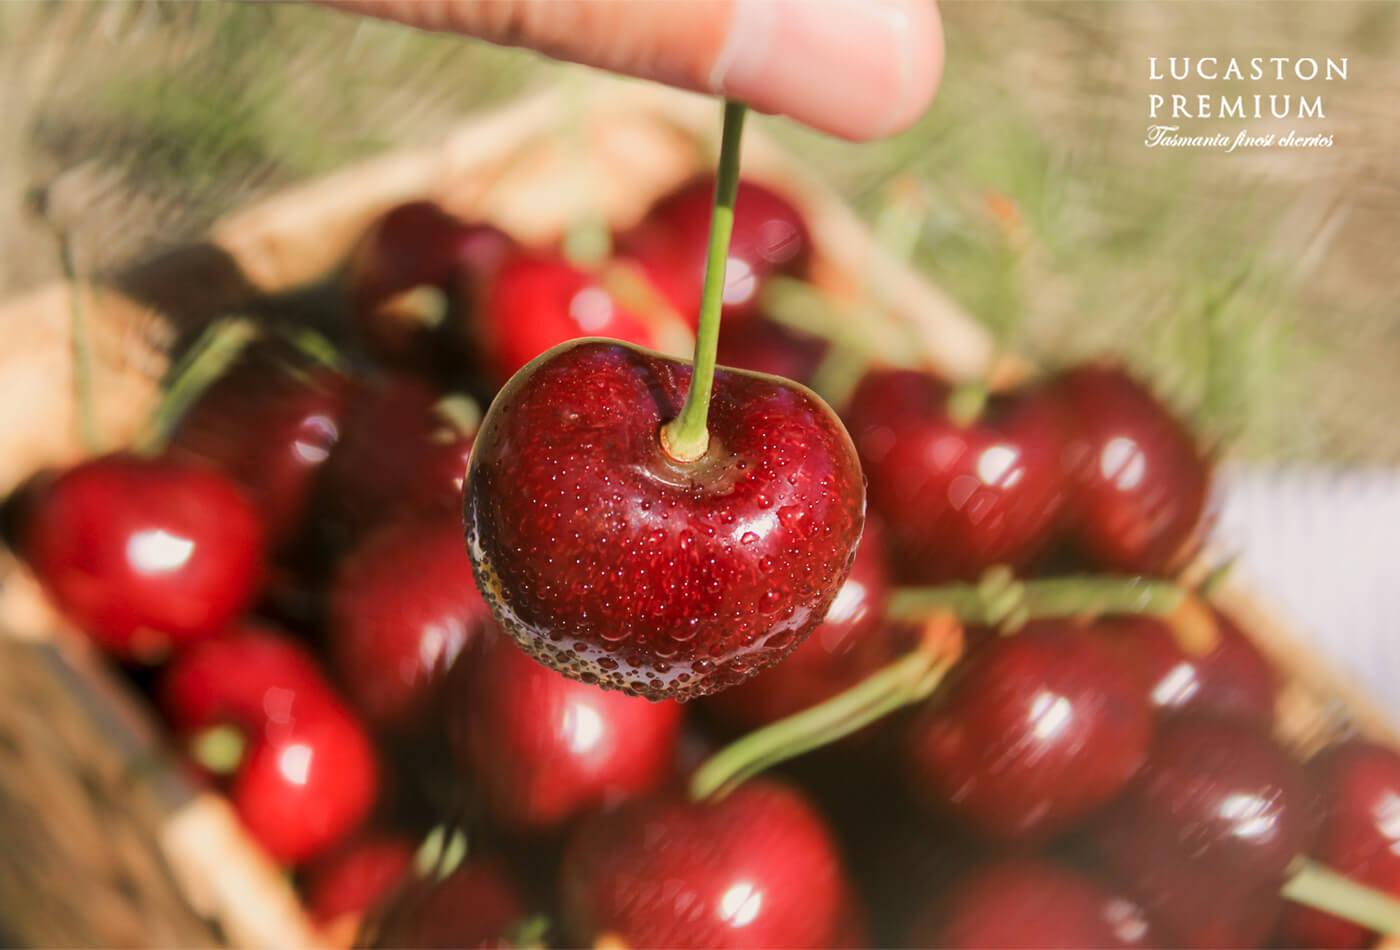 Lucaston Premium伊嚐精品櫻桃。年度限量預購中|櫻桃愛好者味蕾的世界之頂